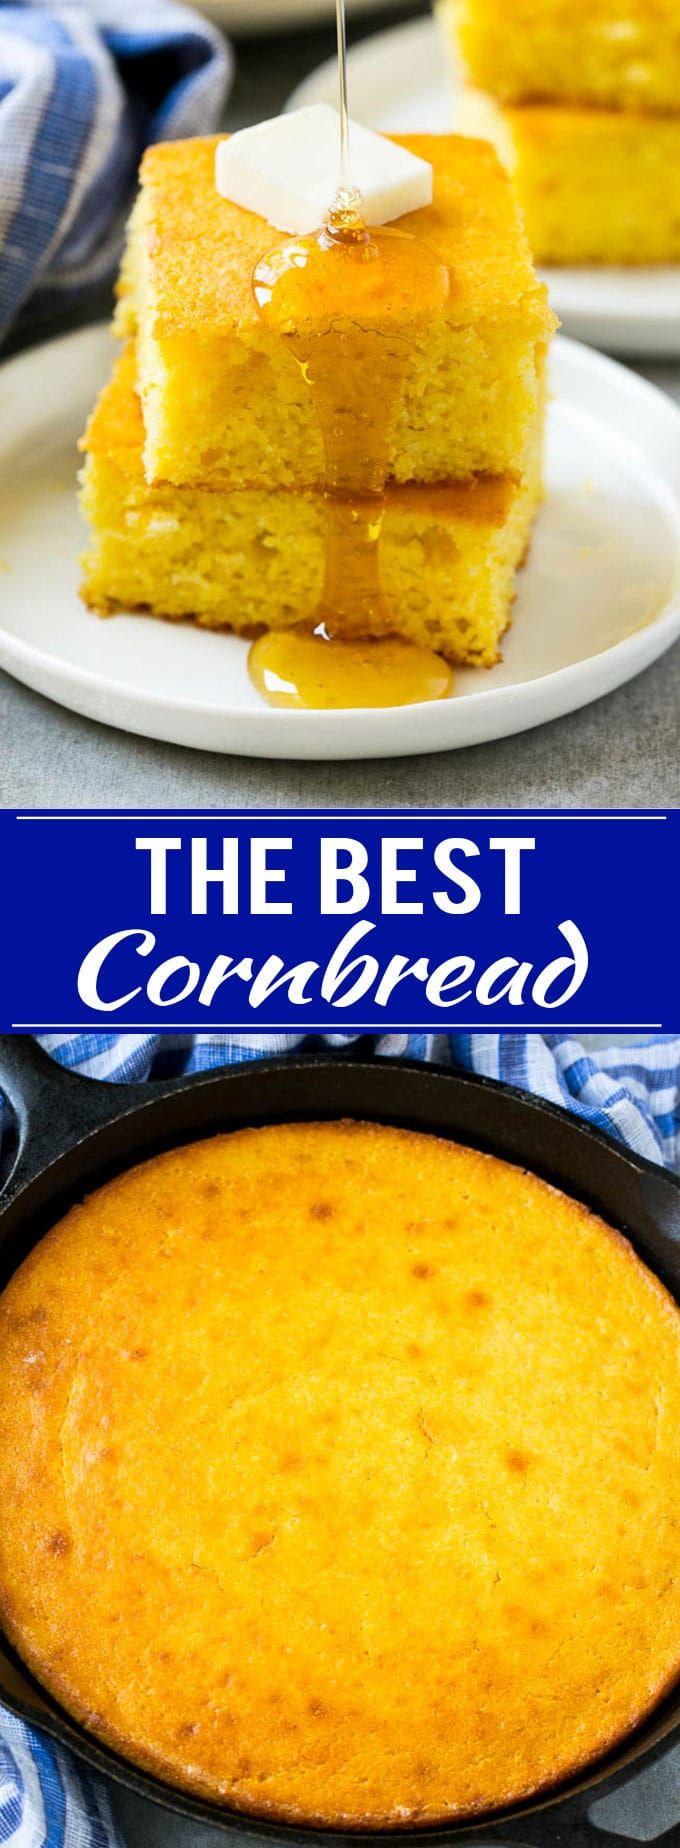 Honey Cornbread Recipe | Buttermilk Cornbread | Easy Cornbread | Homemade Cornbread | Cast Iron Cornbread